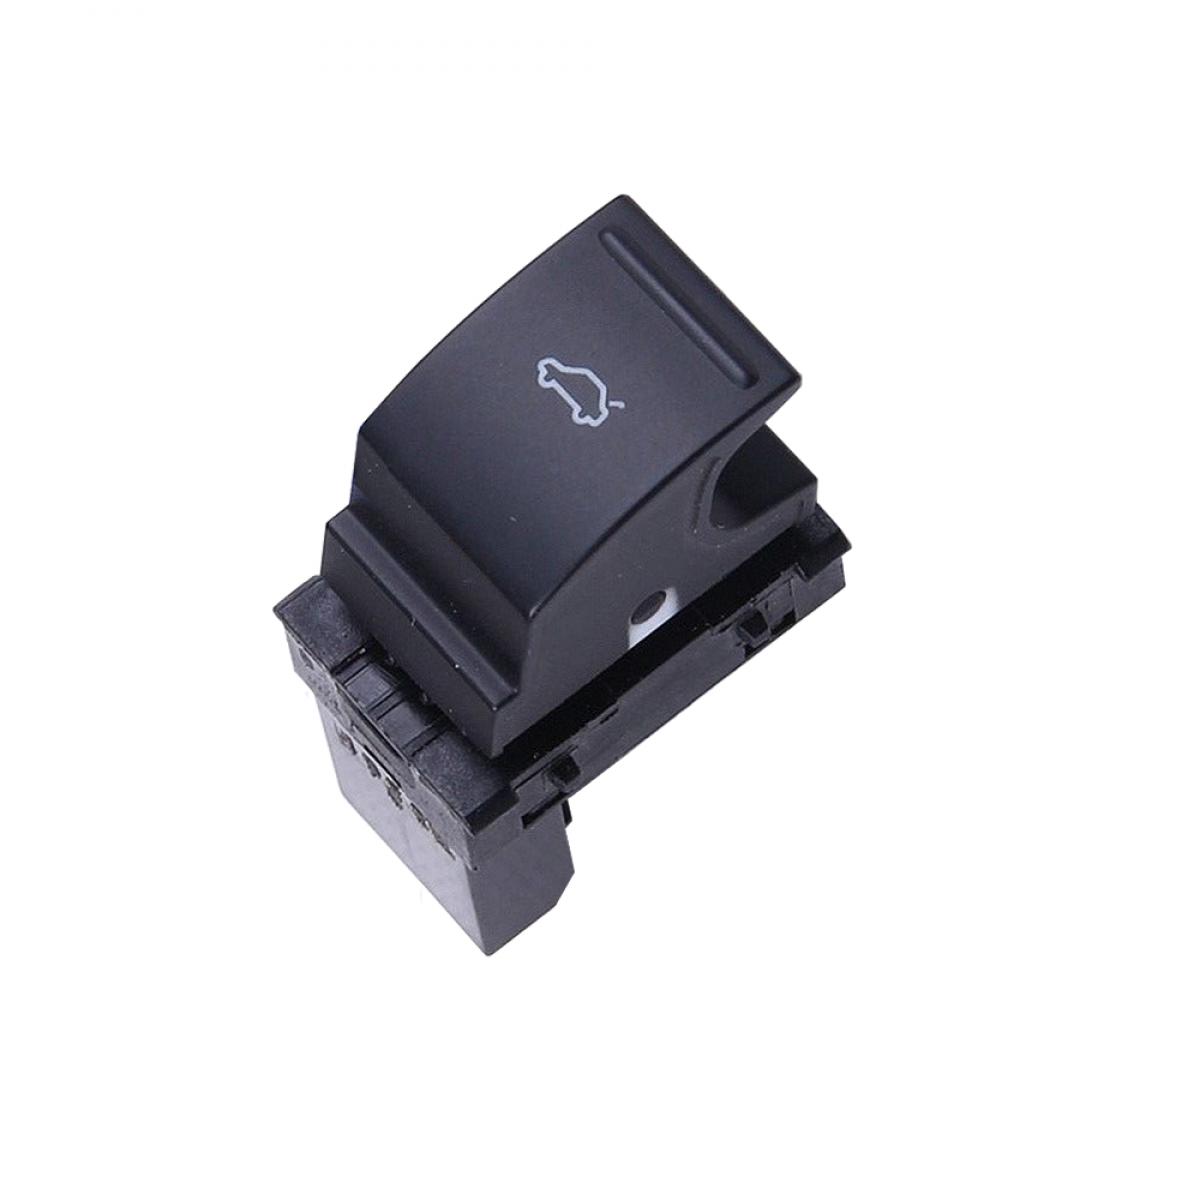 Bagaj Açma Düğmesi - Polo - Jetta - Scirocco